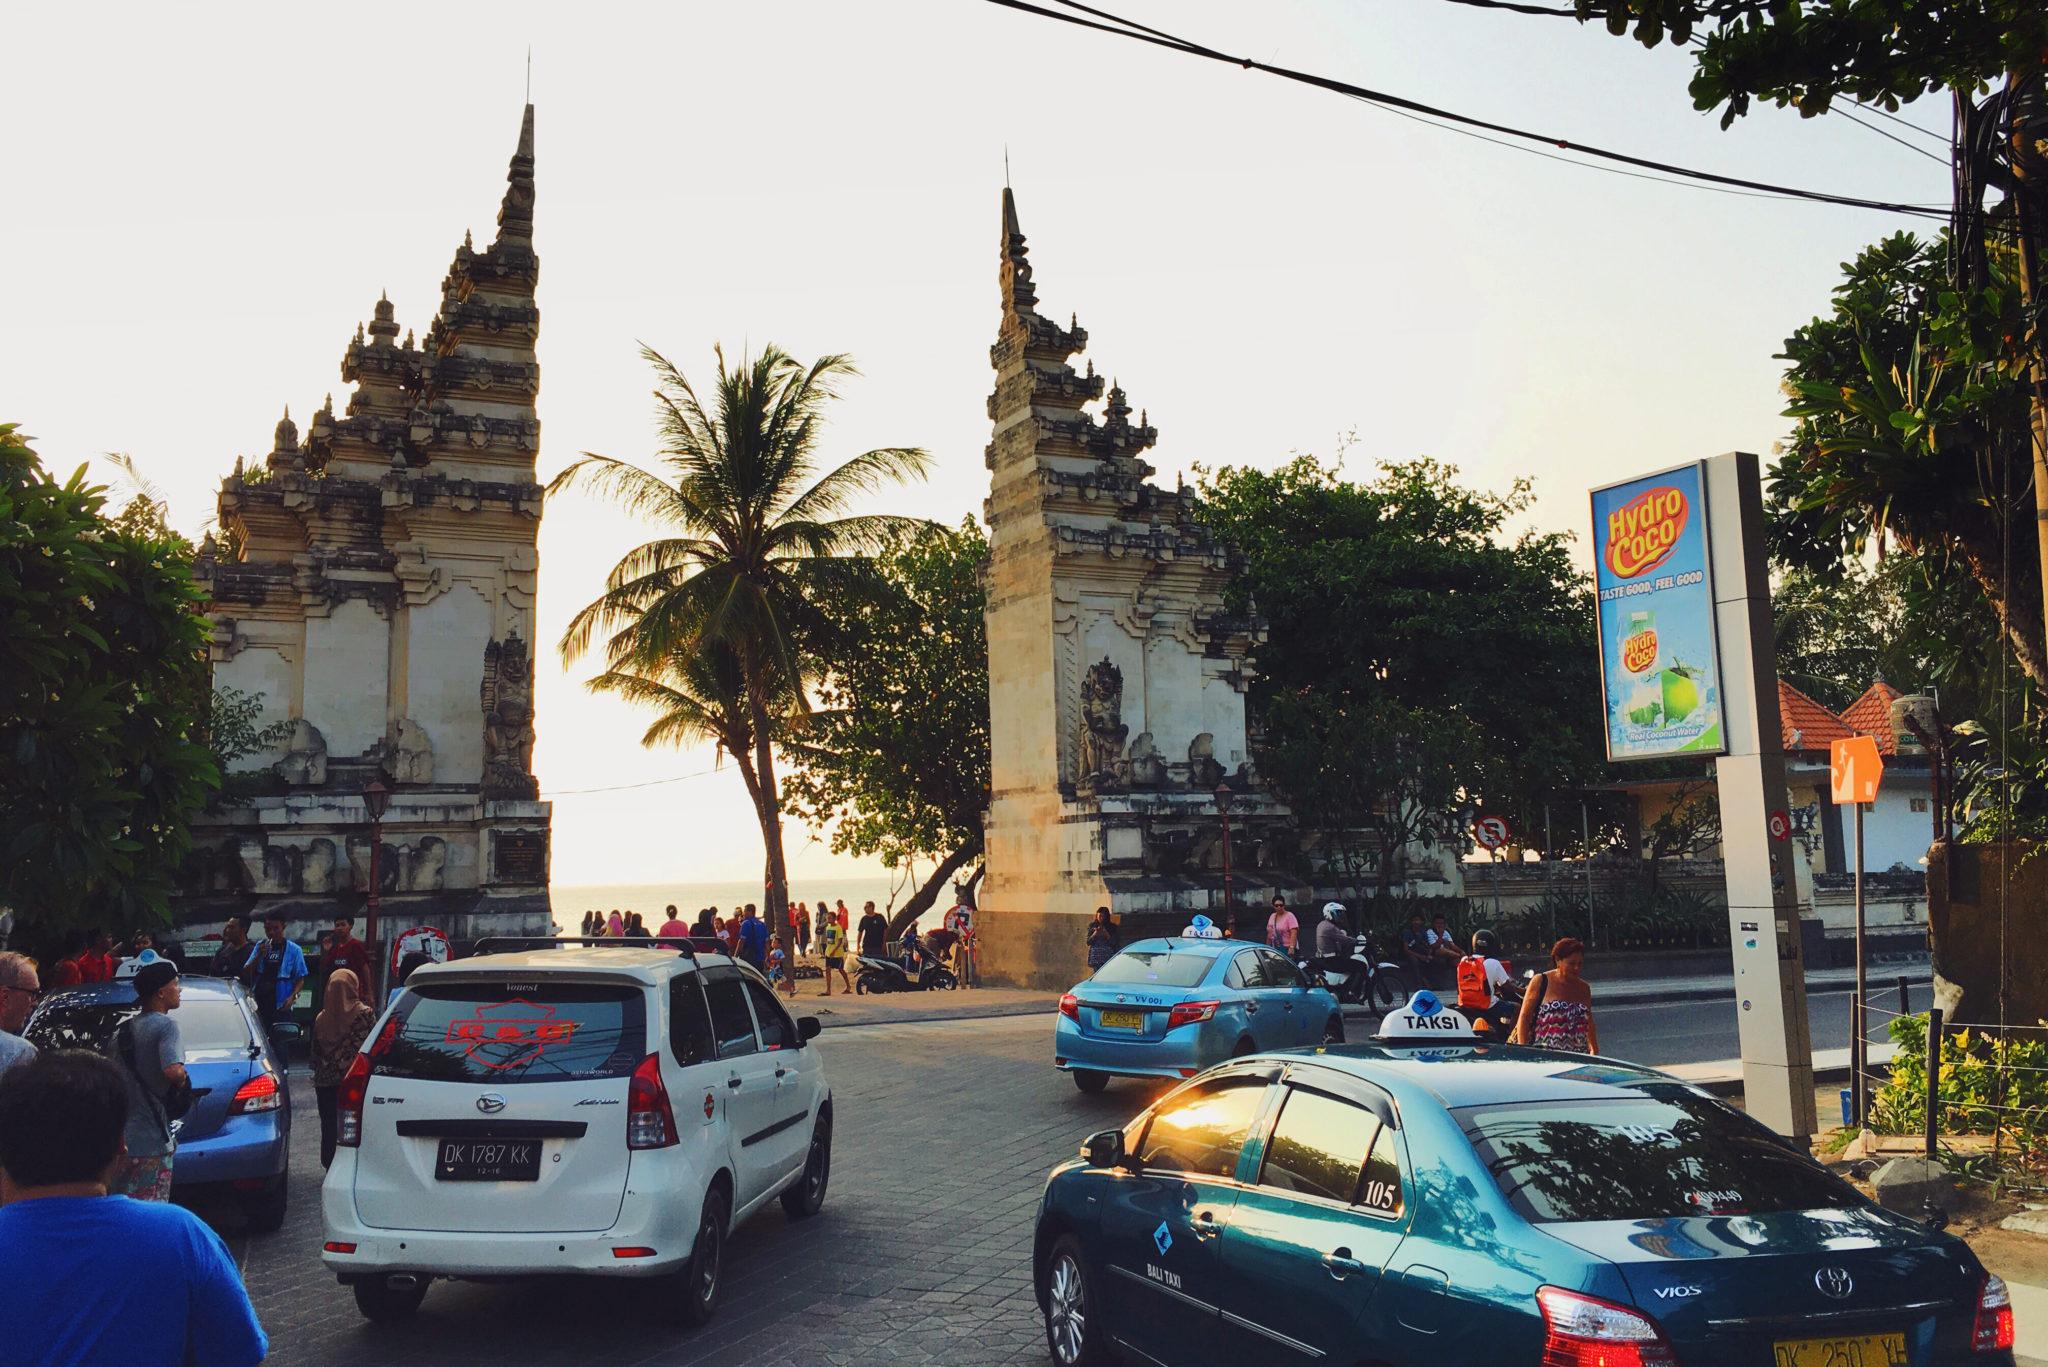 Indonesien-Reisetipps-Kuta-Bali